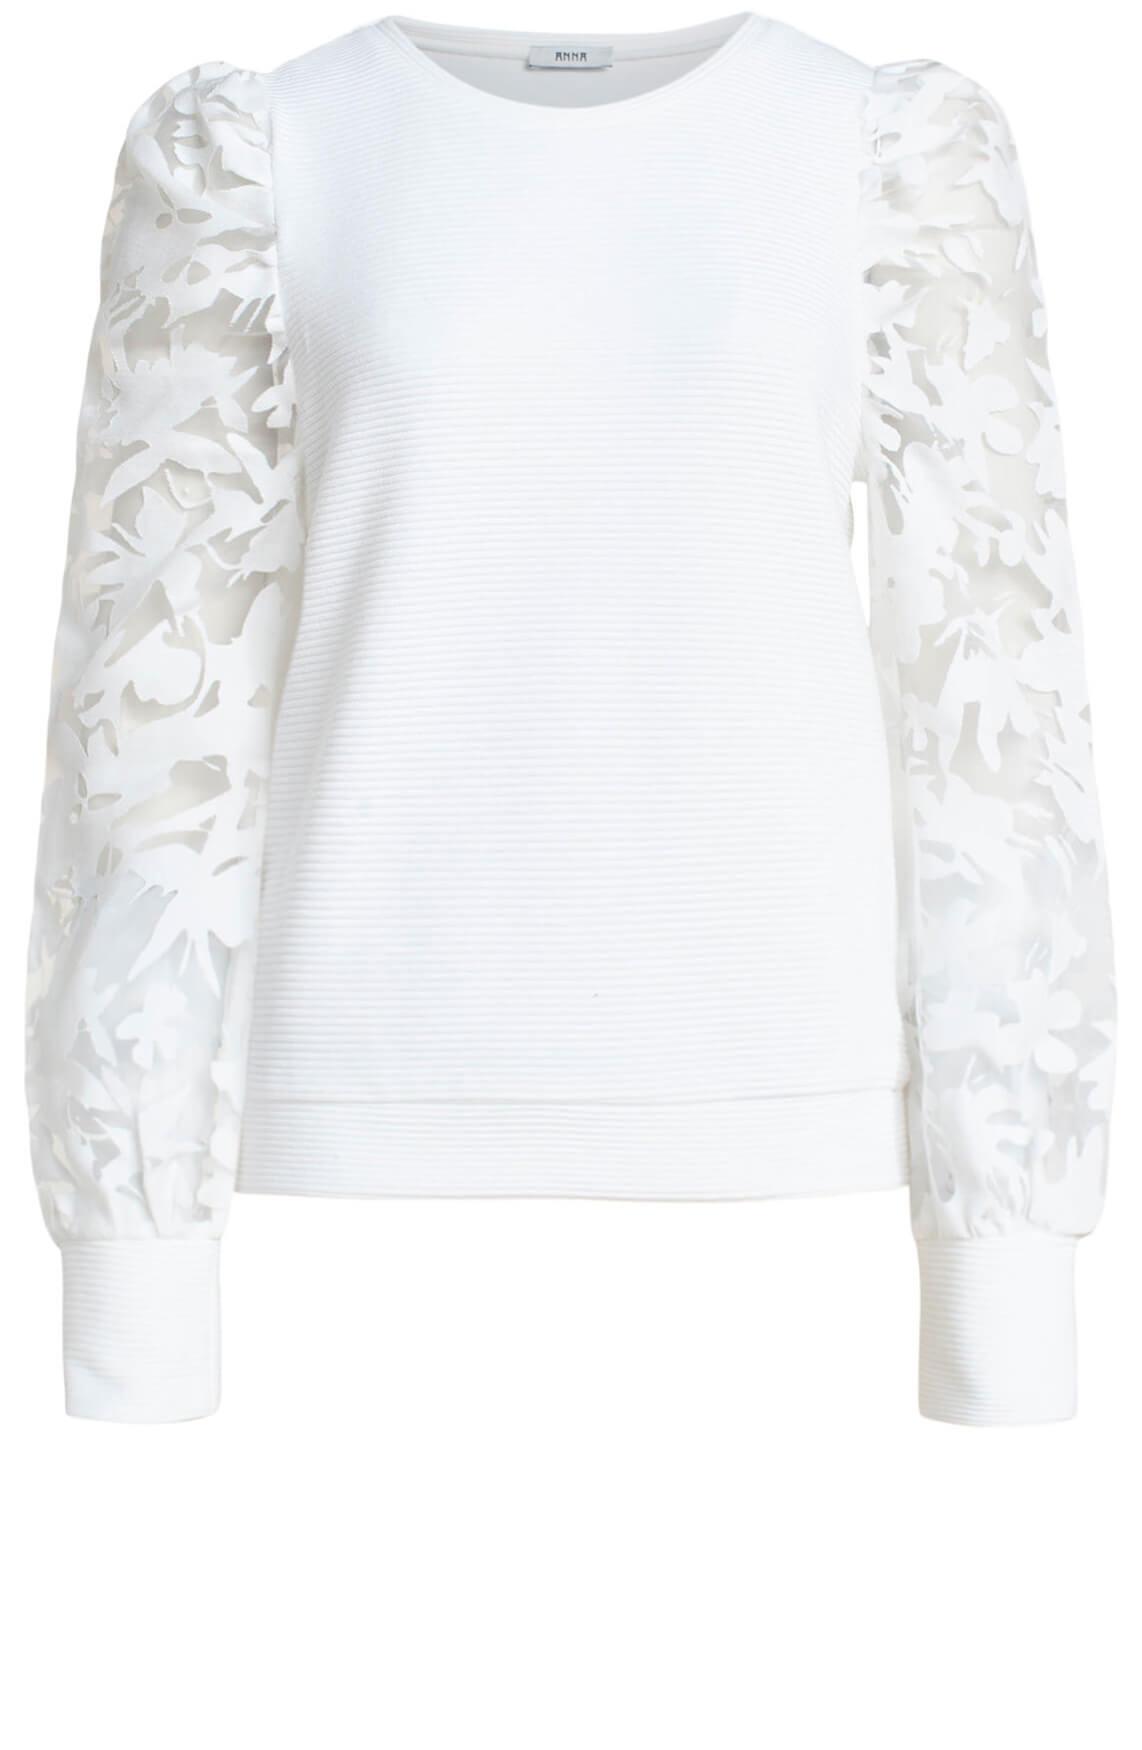 Anna Dames Sweatshirt met kant wit